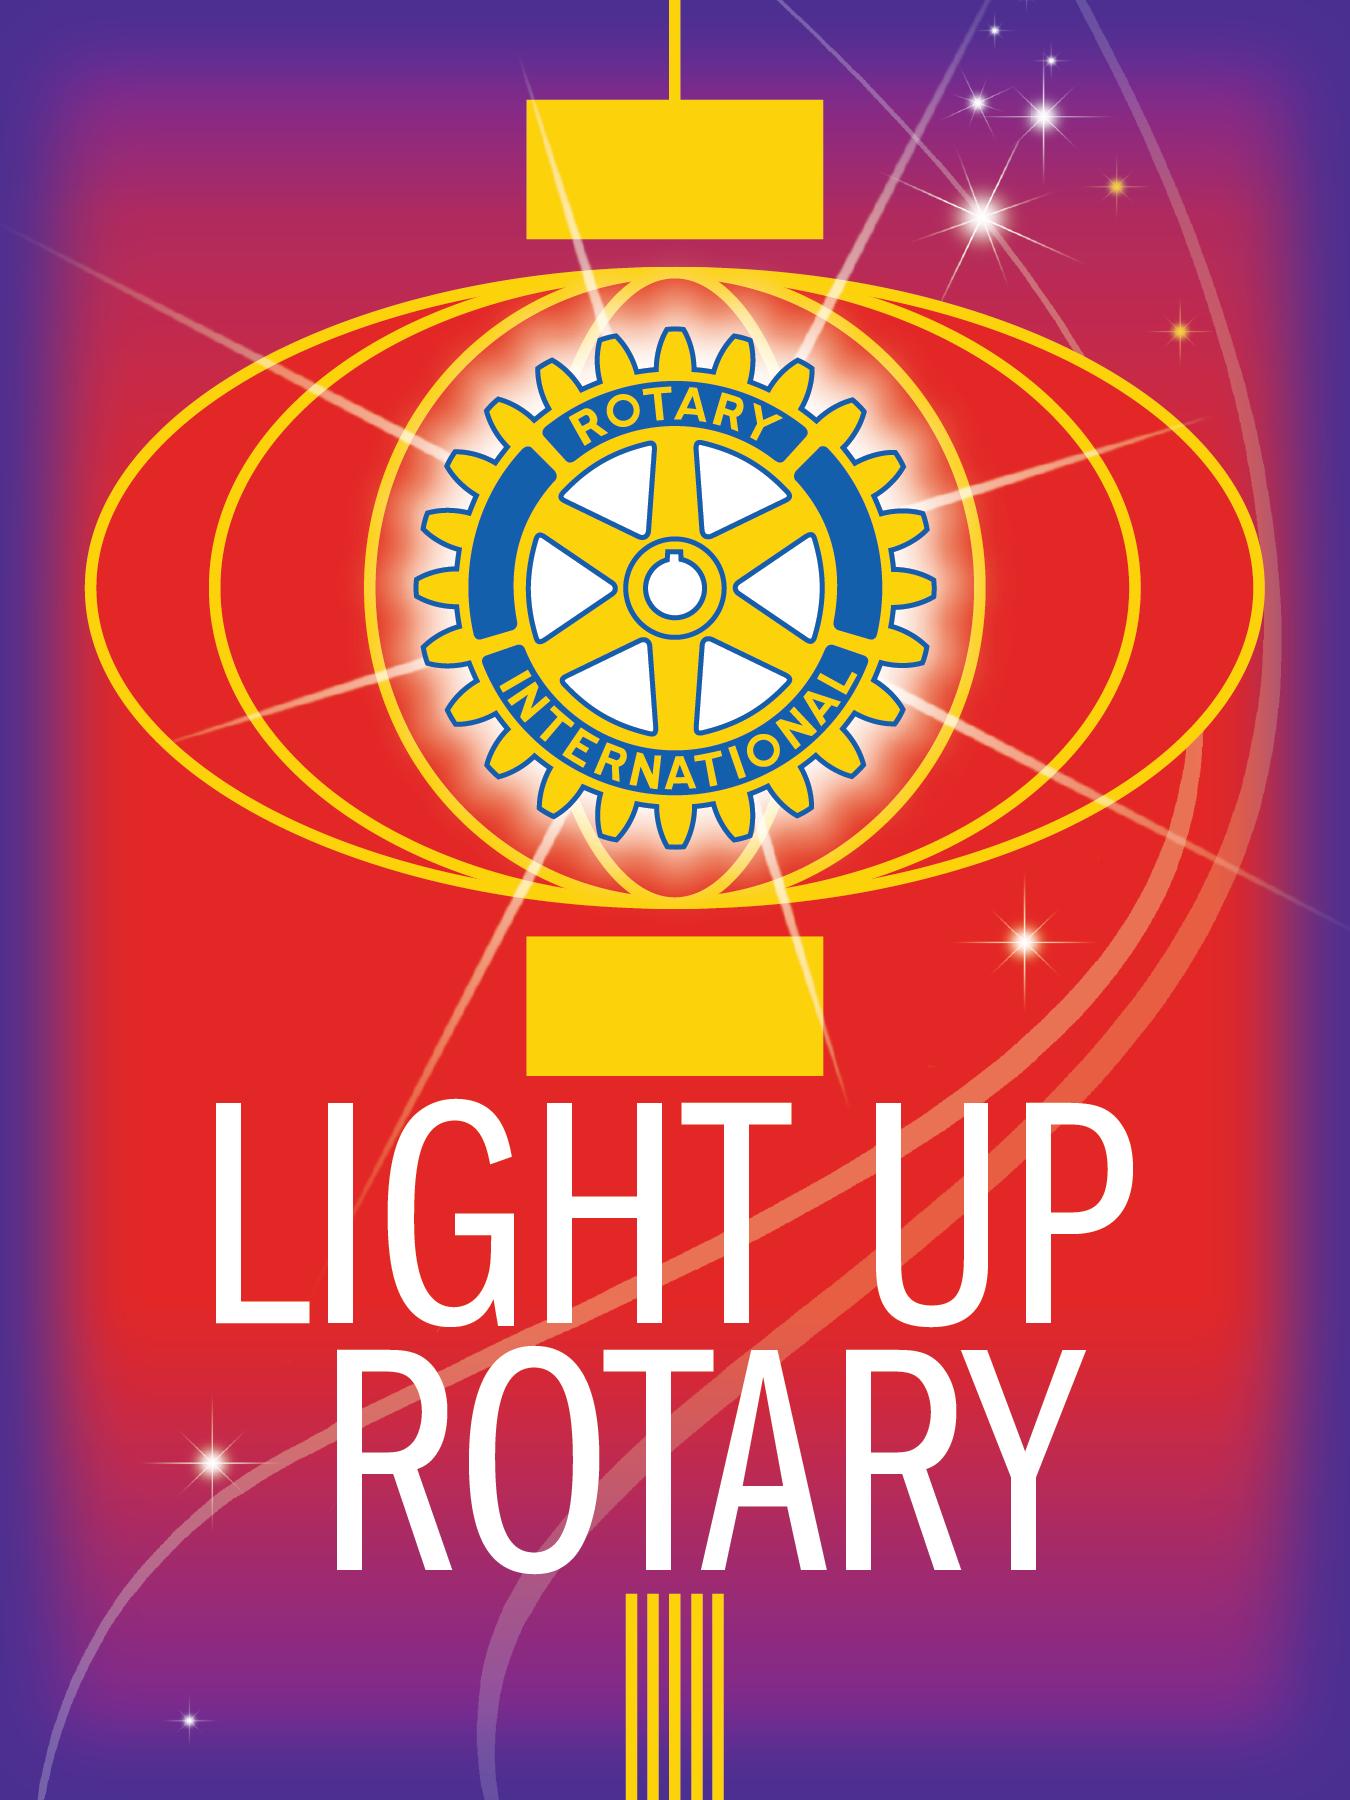 2014 - 15 Rotary International Theme